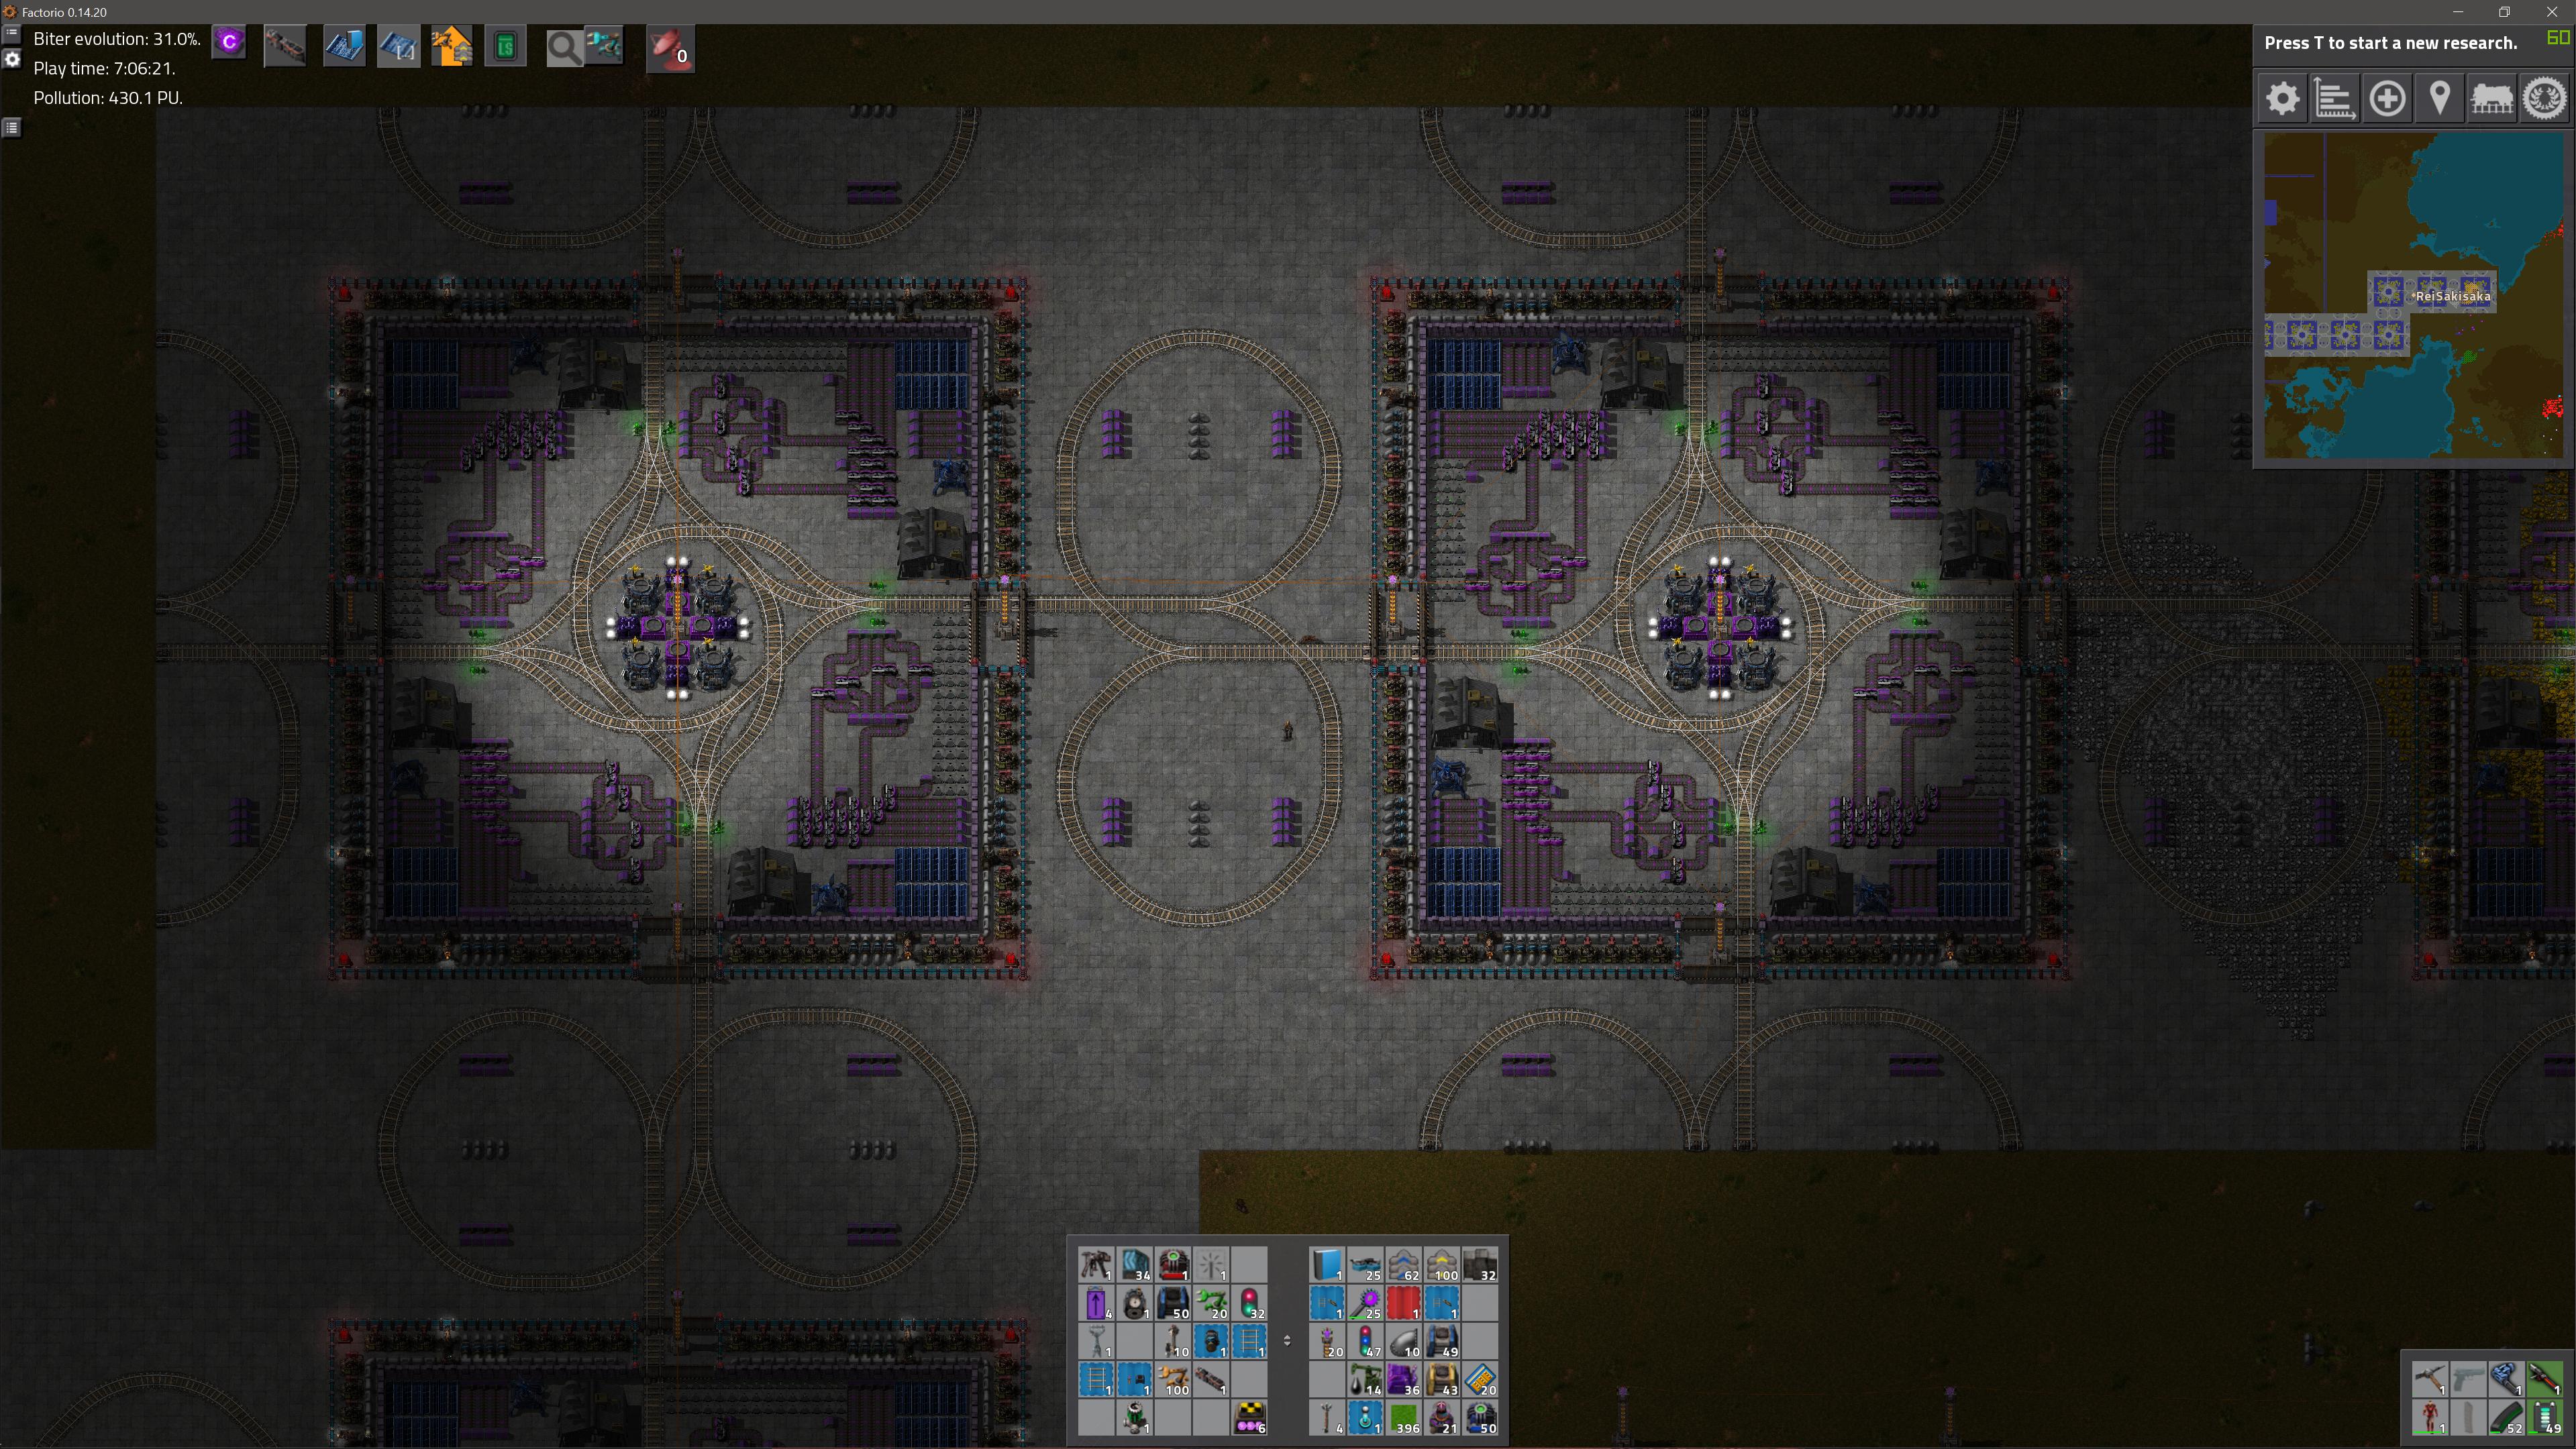 Elegant Incredible Inefficient Modular Factorio Outpost By ReiSakisaka Incredible  Inefficient Modular Factorio Outpost By ReiSakisaka